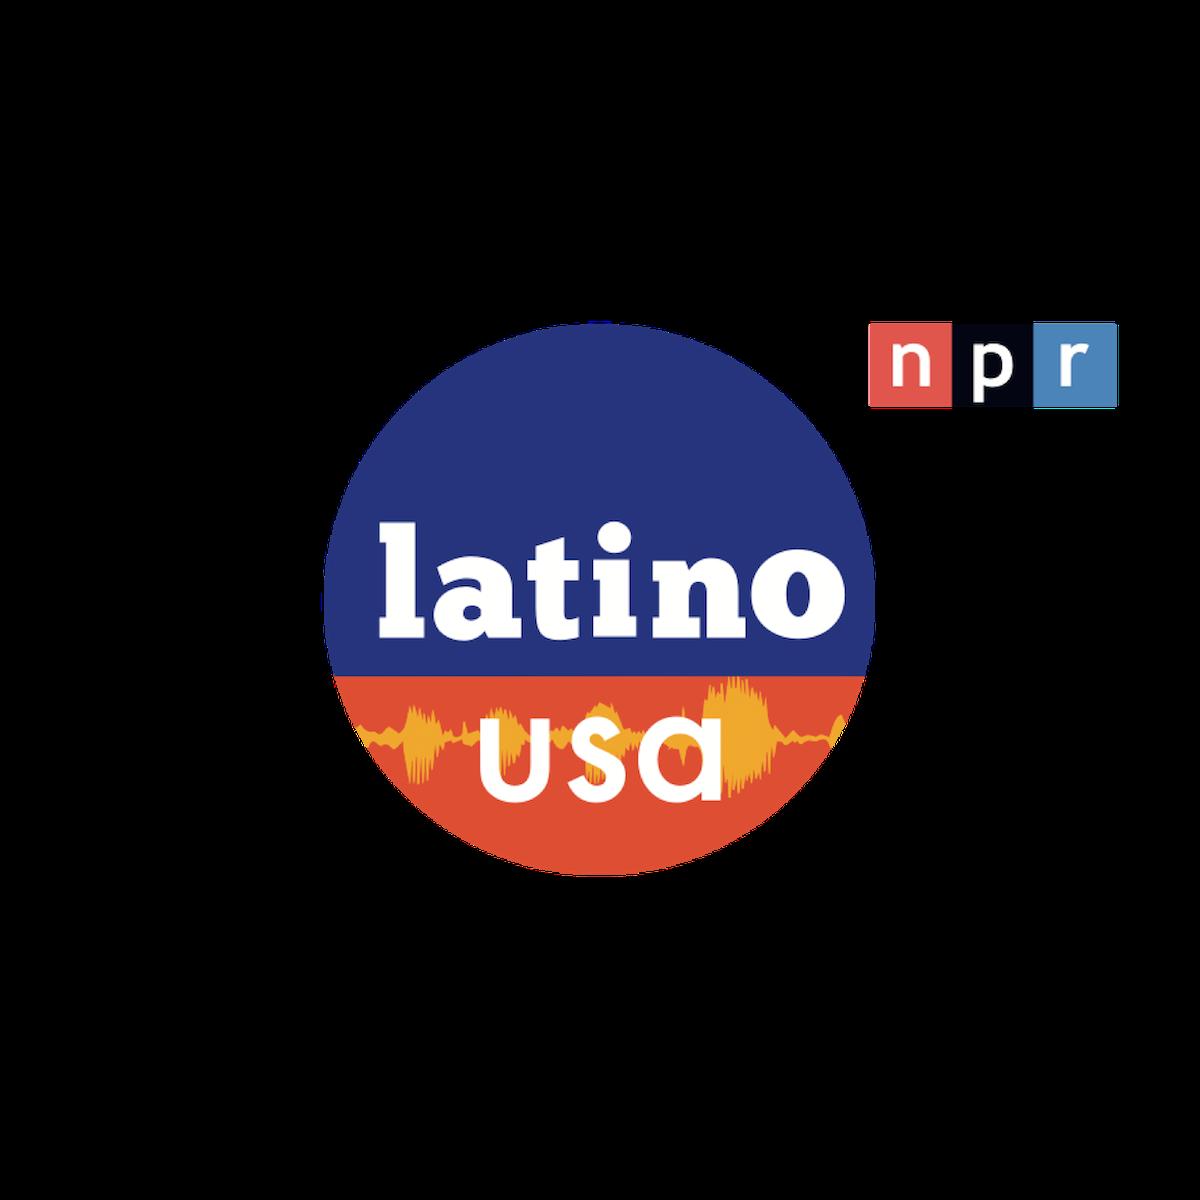 The Racial History of Weed for NPR's Latino USA -